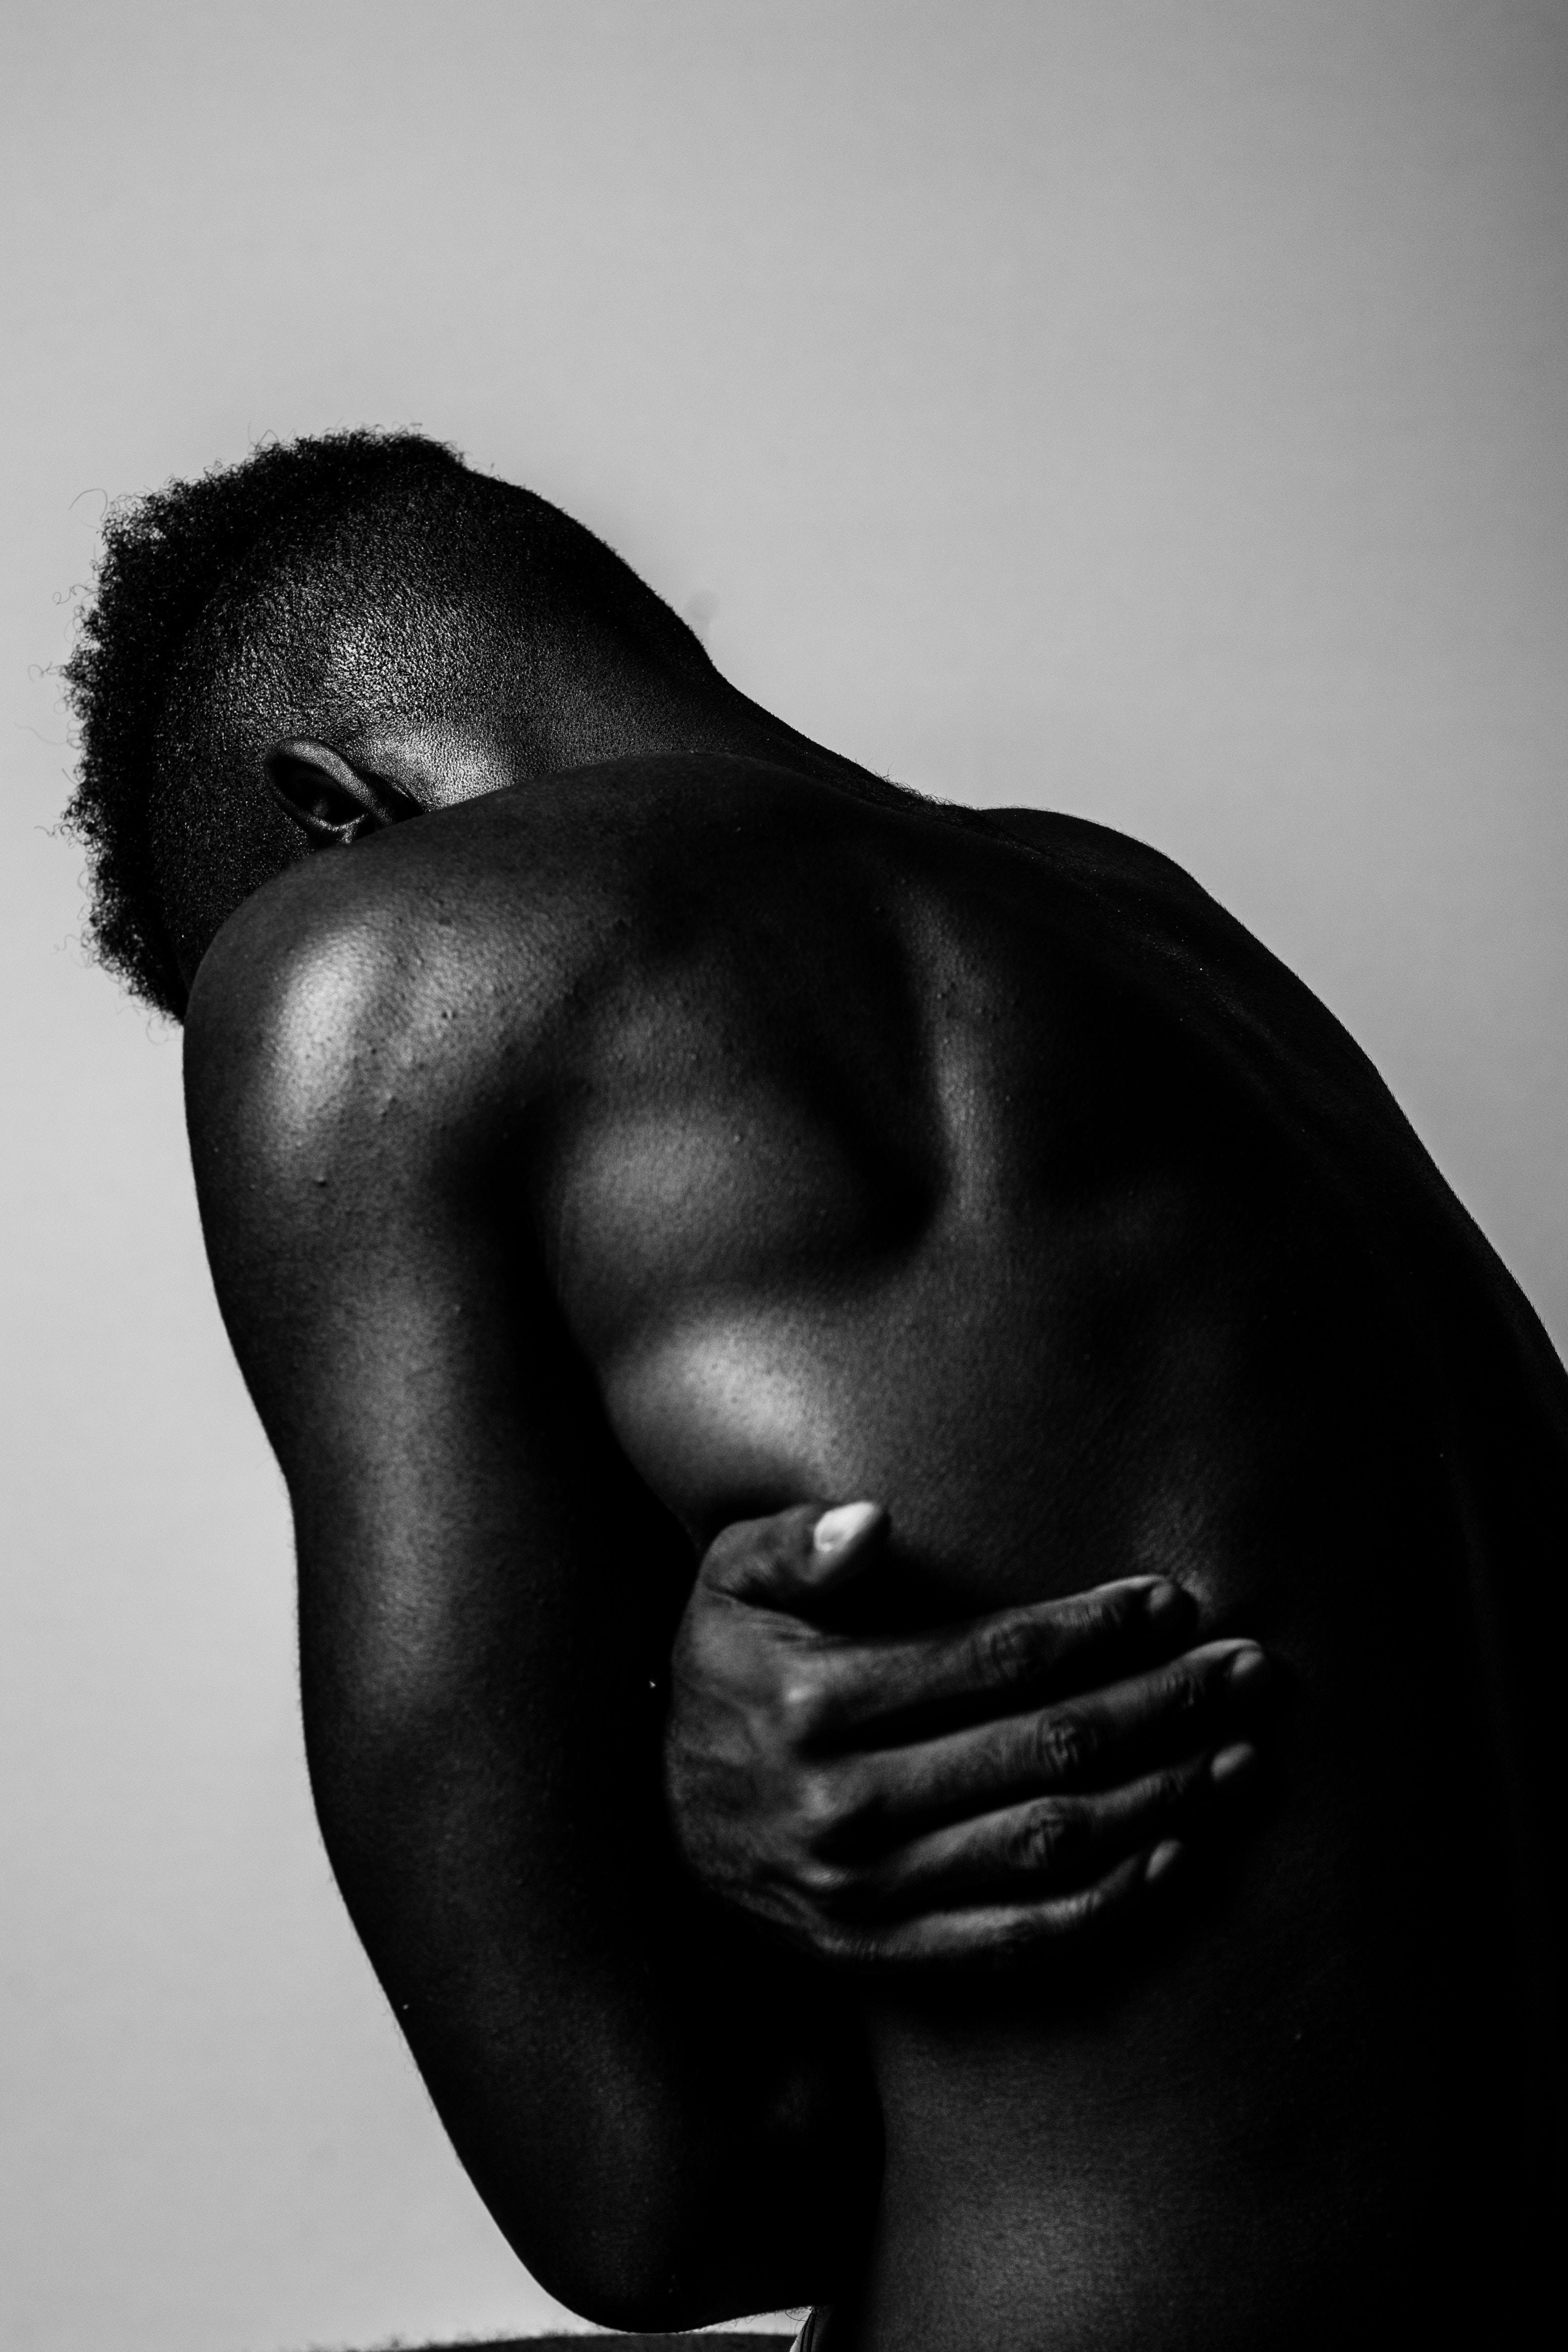 Image: Unsplash - Sam Burriss